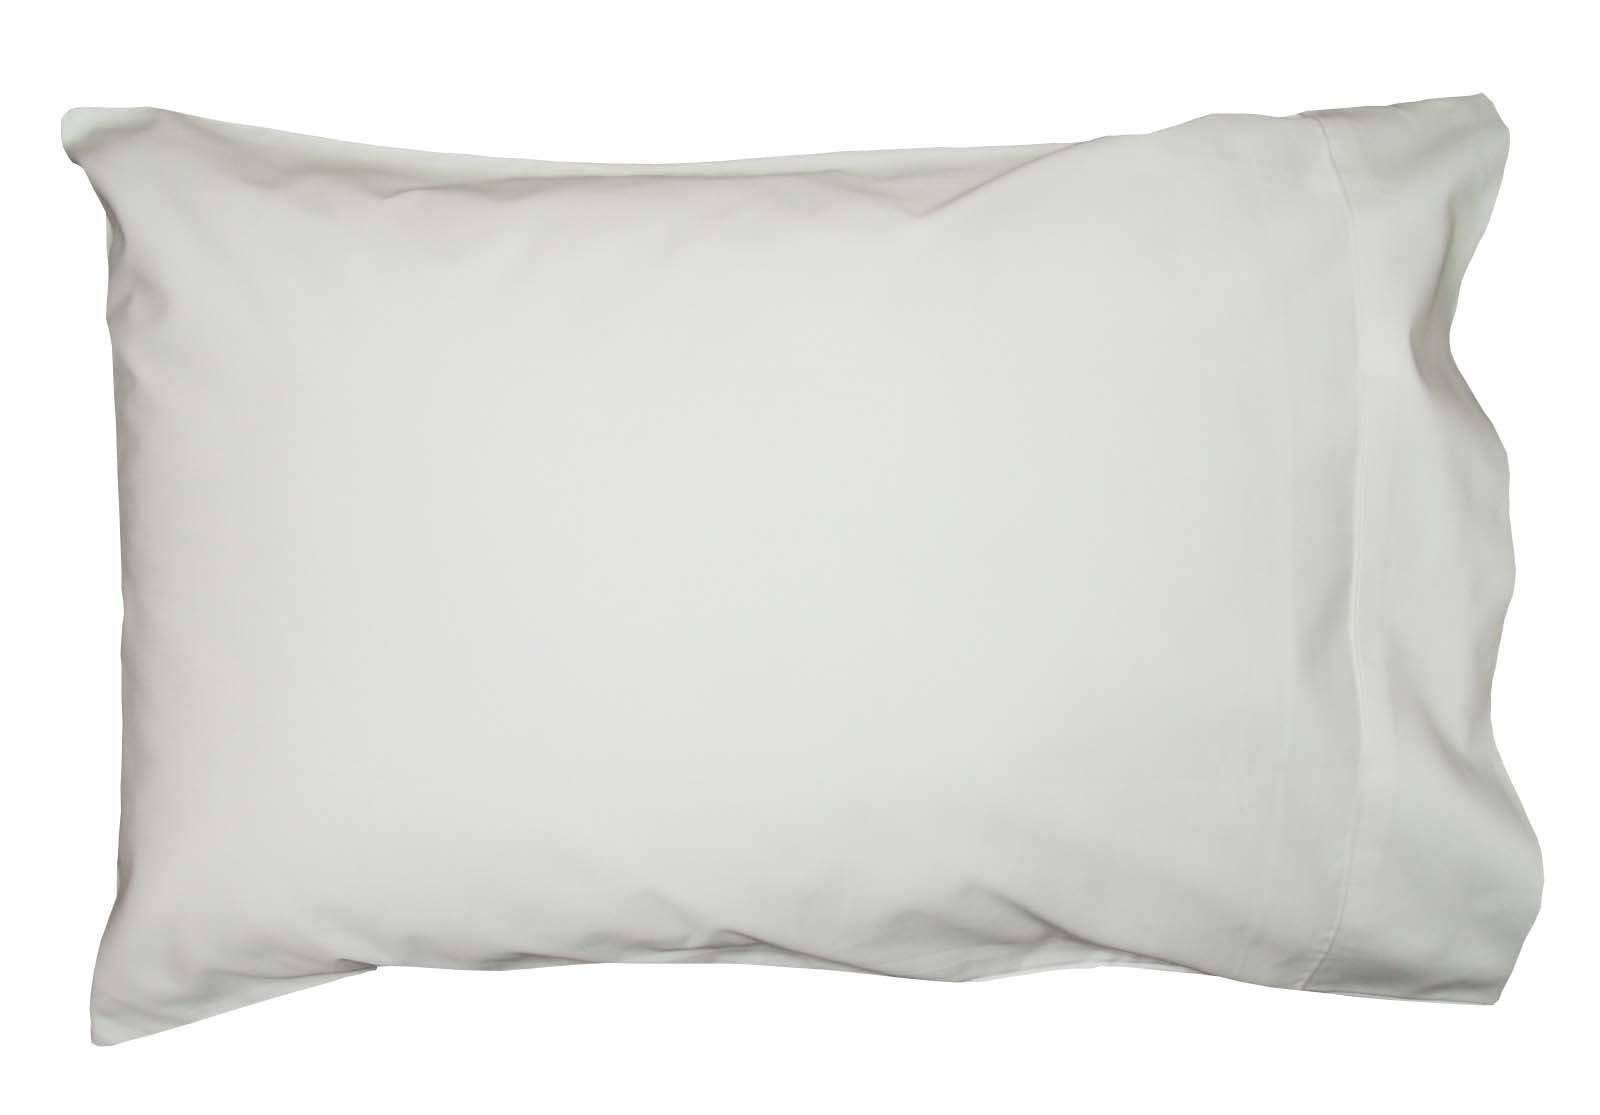 Pillowcases Pure Cotton 1000 Tc Ecoliving Ecoliving